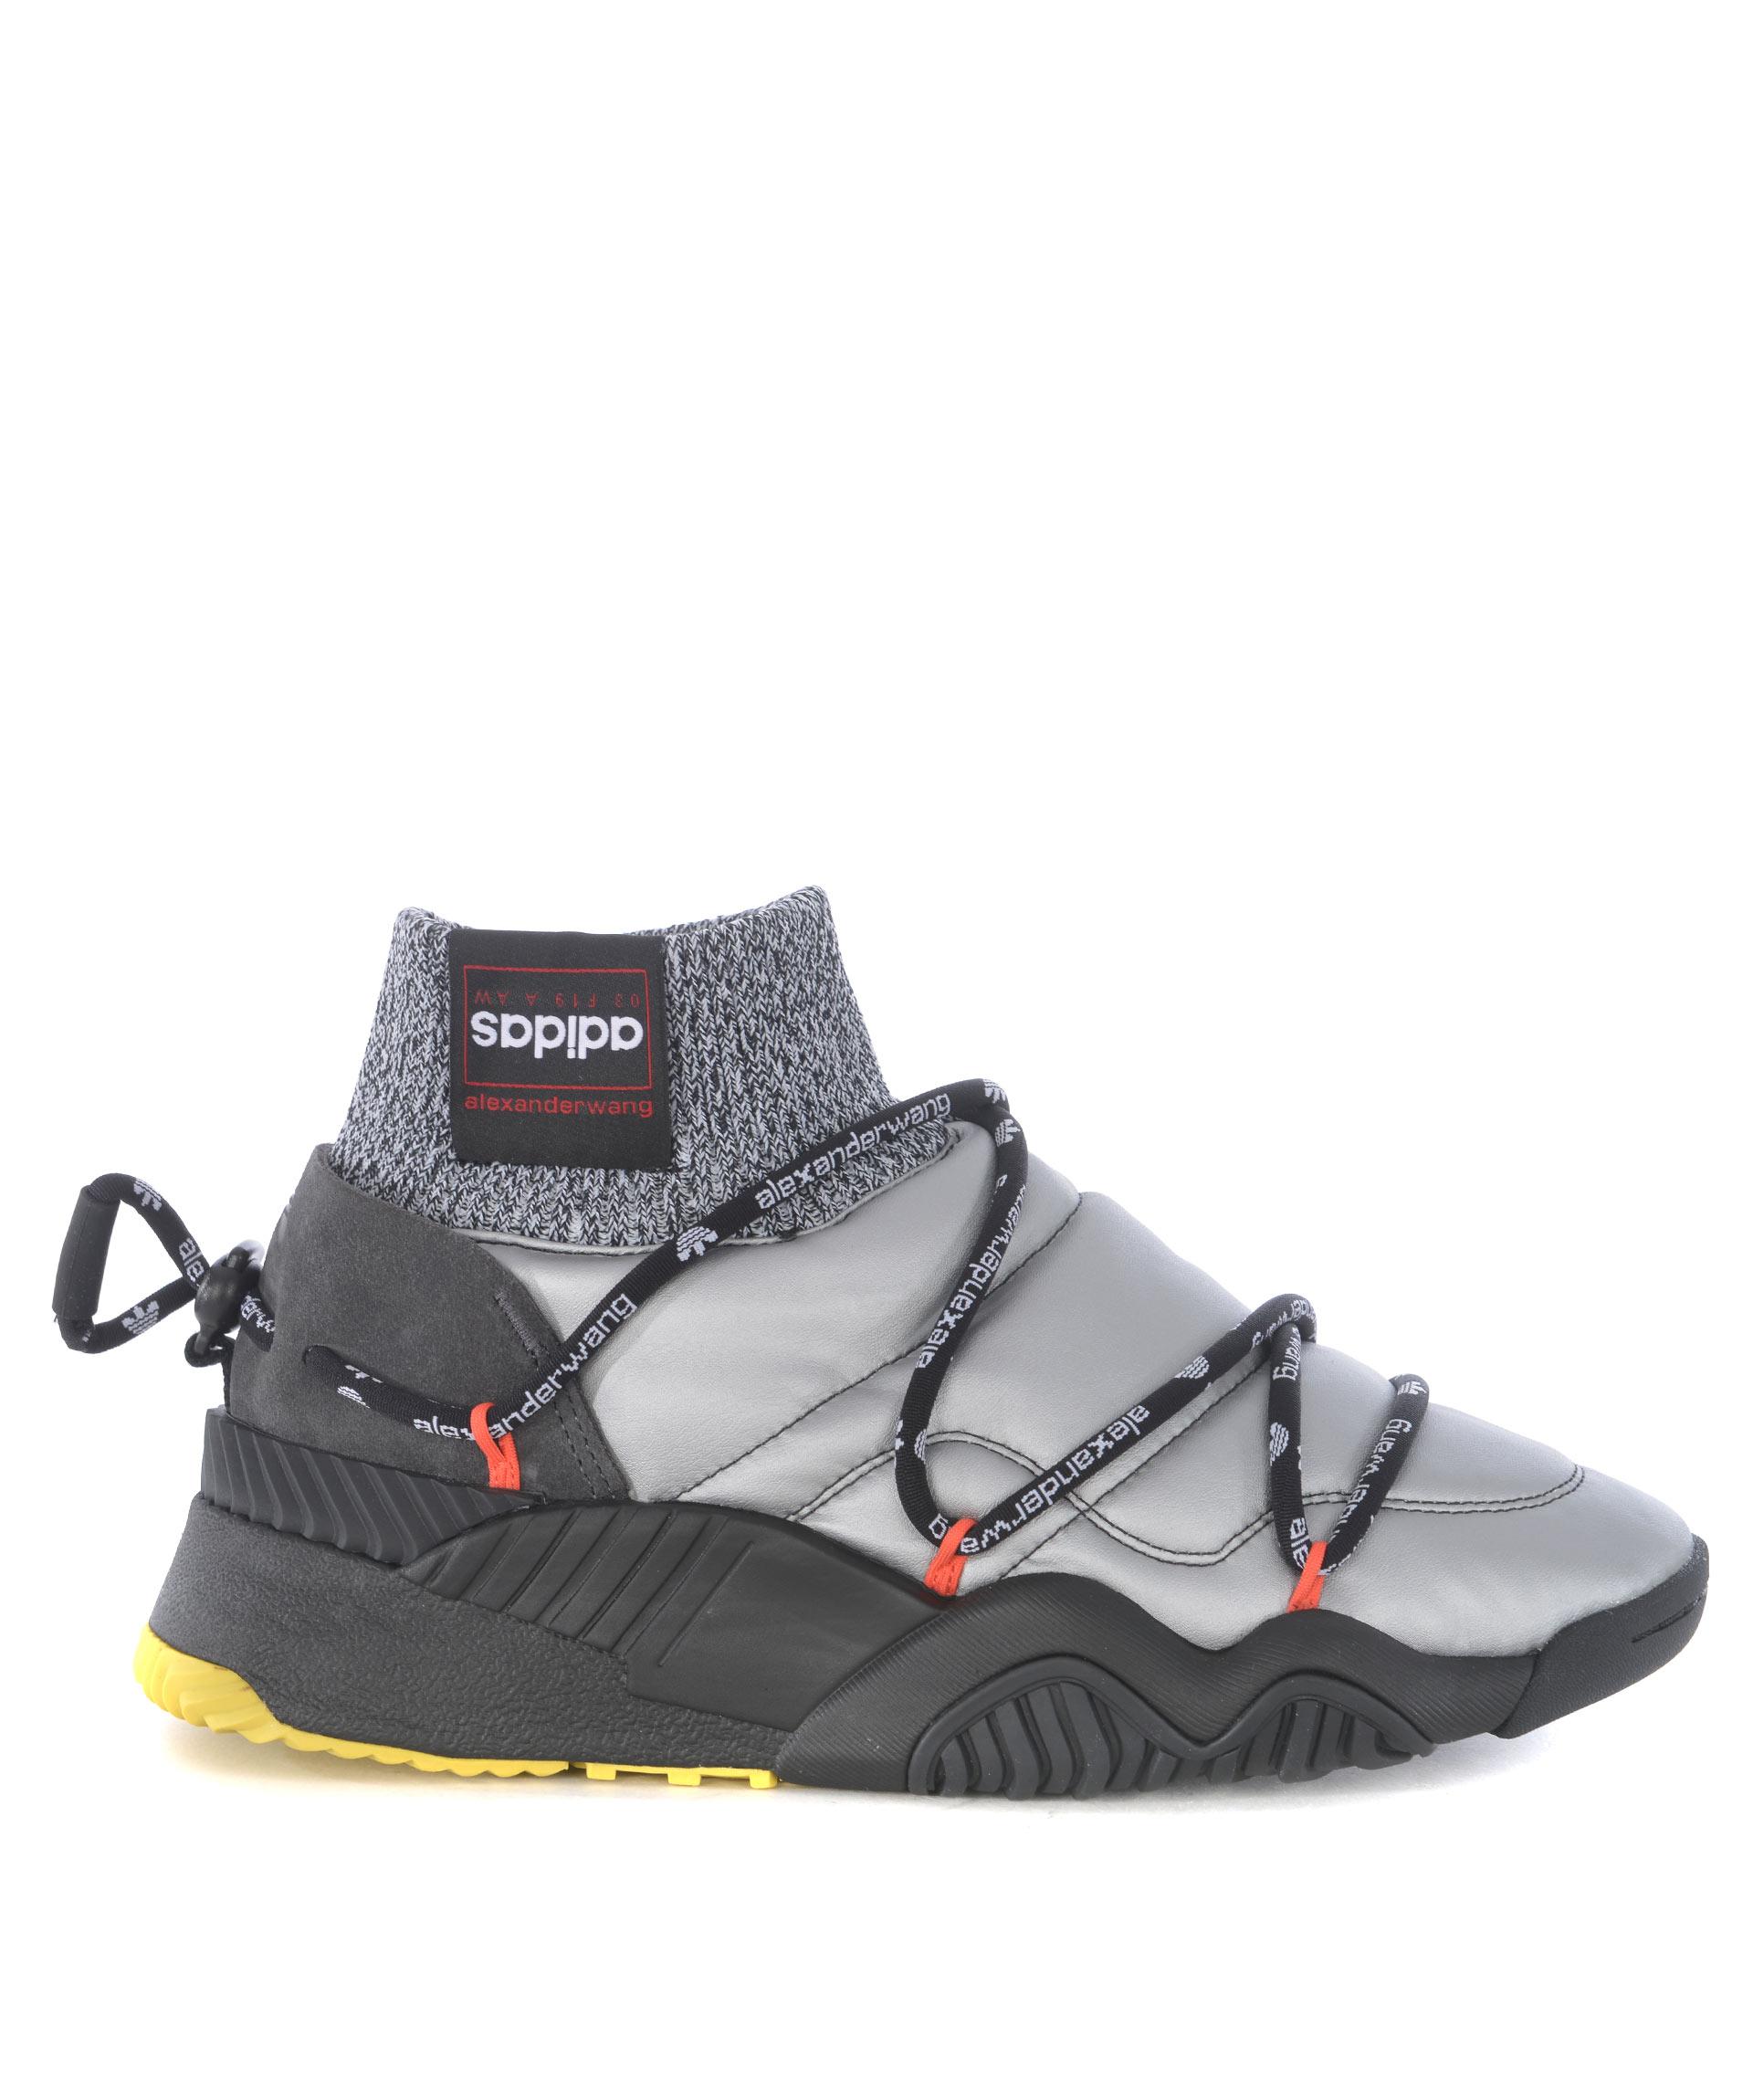 Sneakers uomo Adidas Originals by Alexander Wang puff trainer